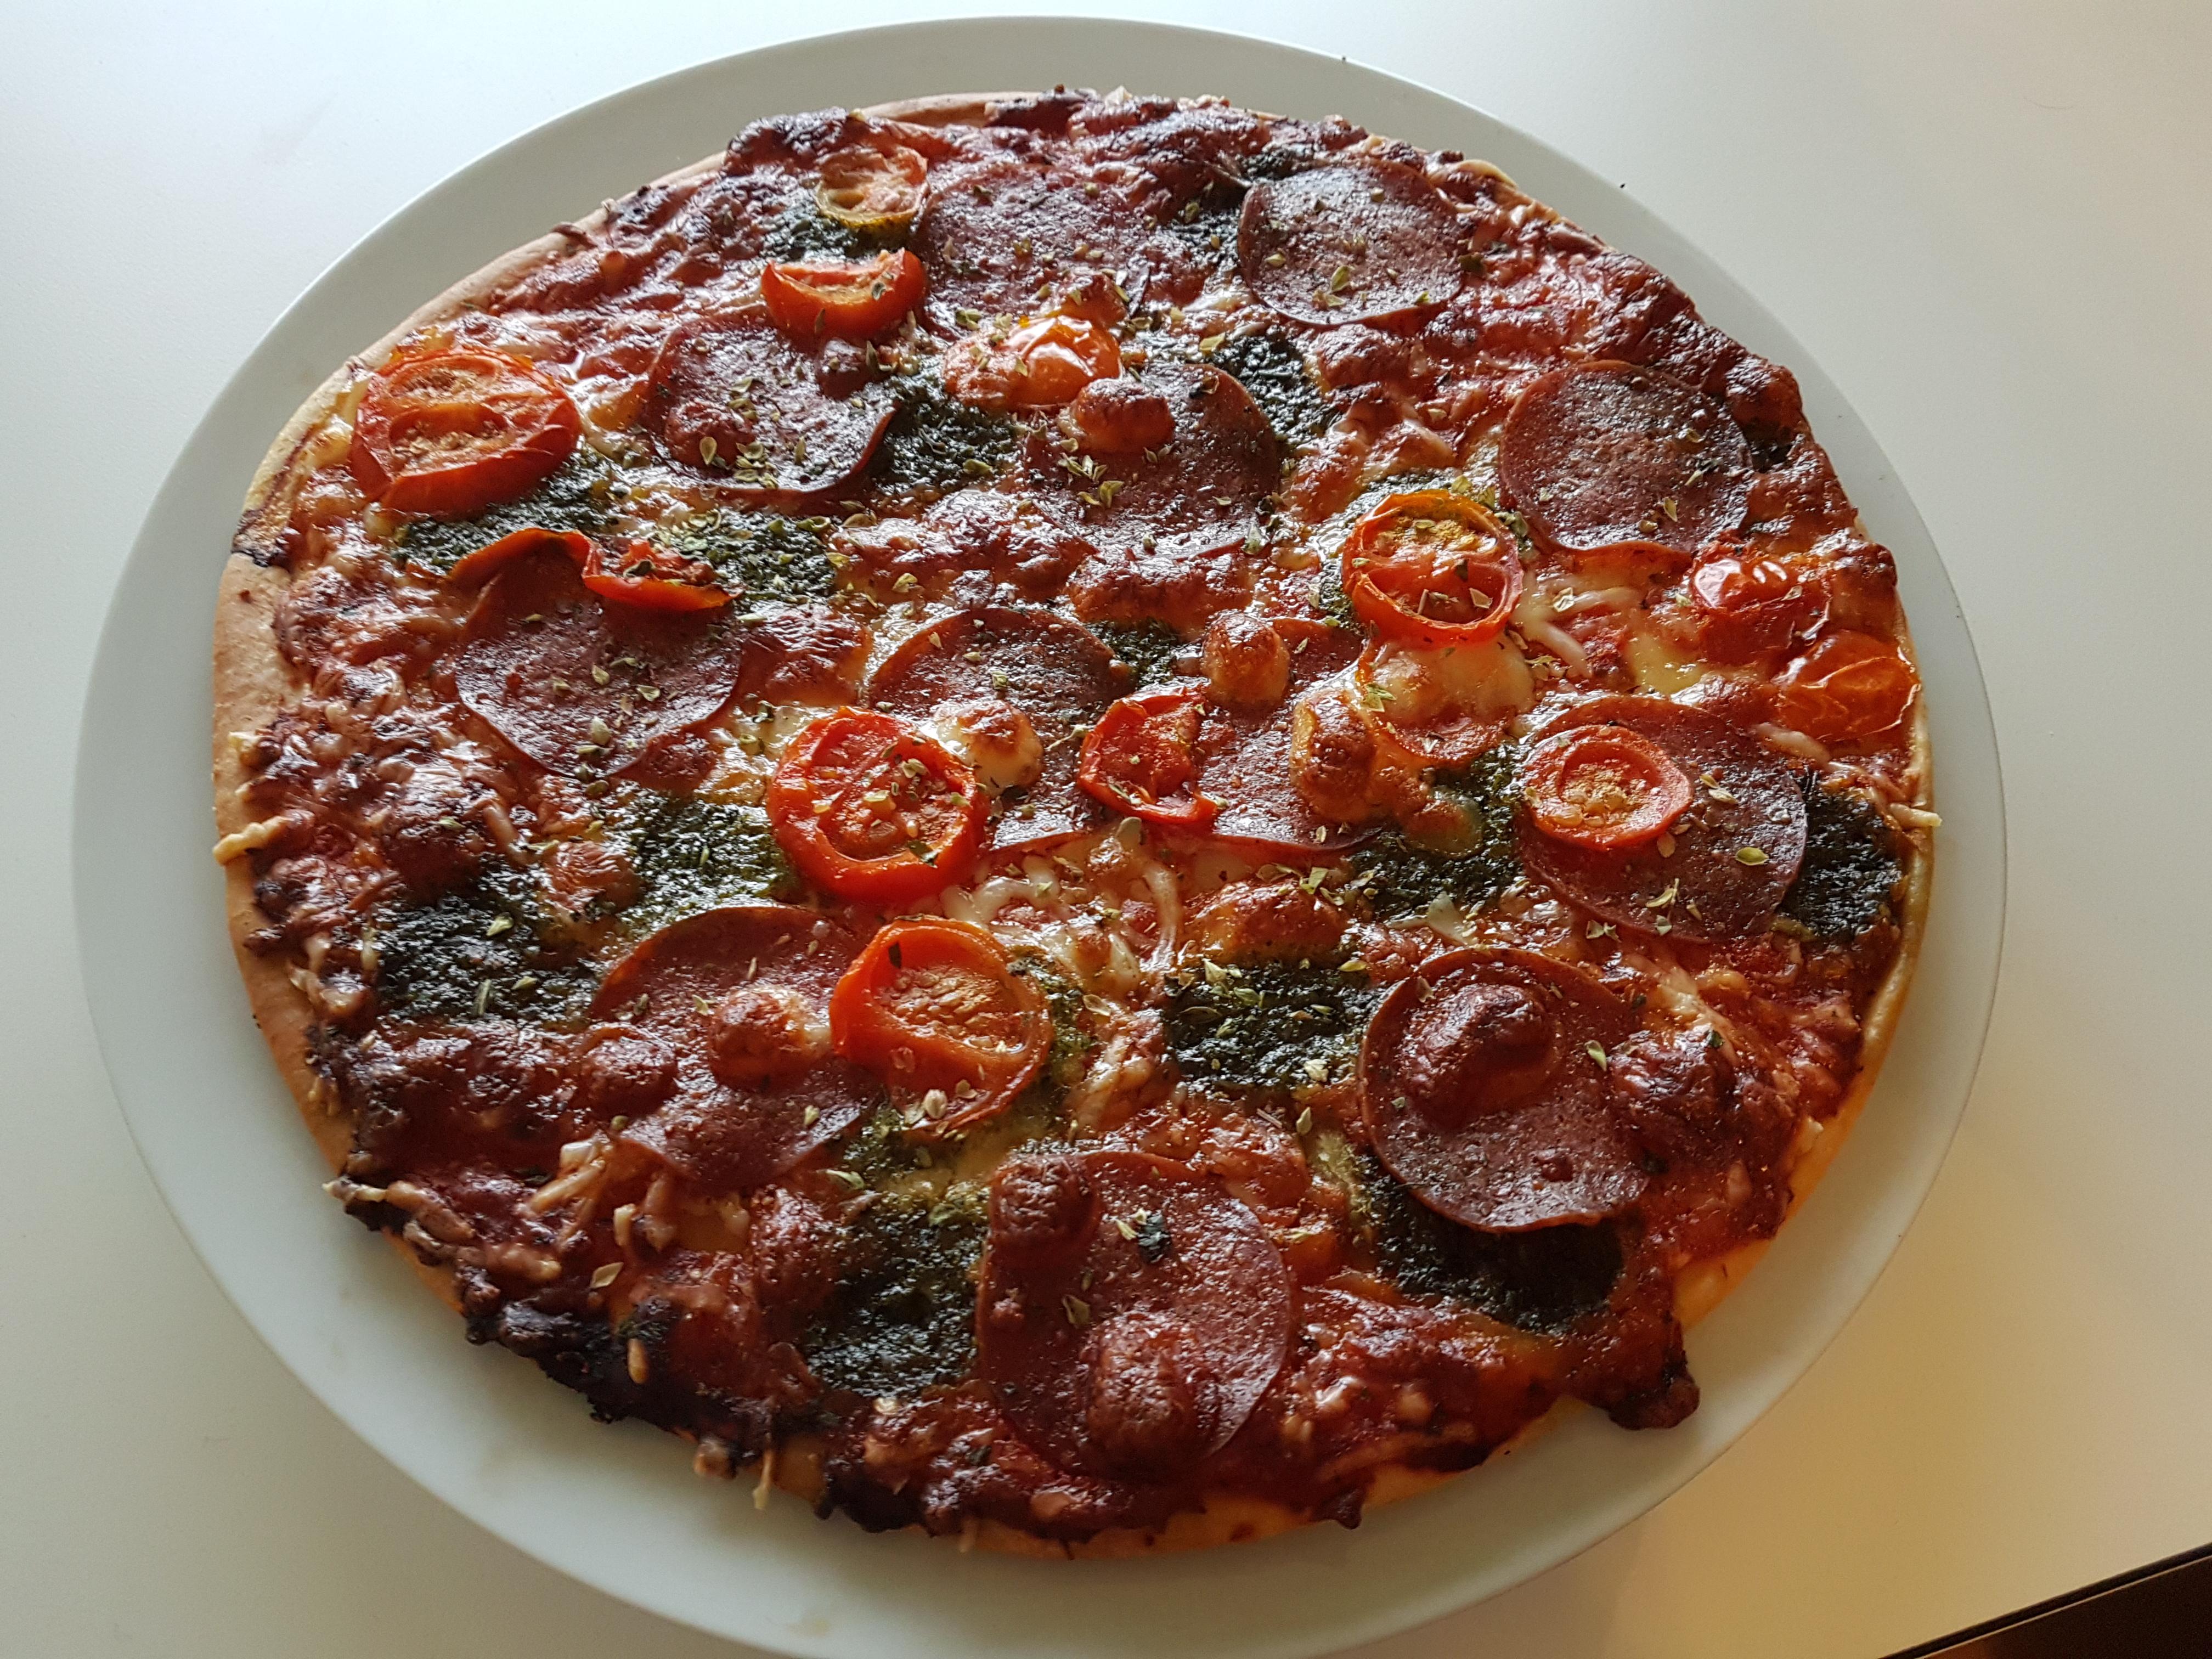 http://foodloader.net/Holz_2017-10-26_Pizza.jpg